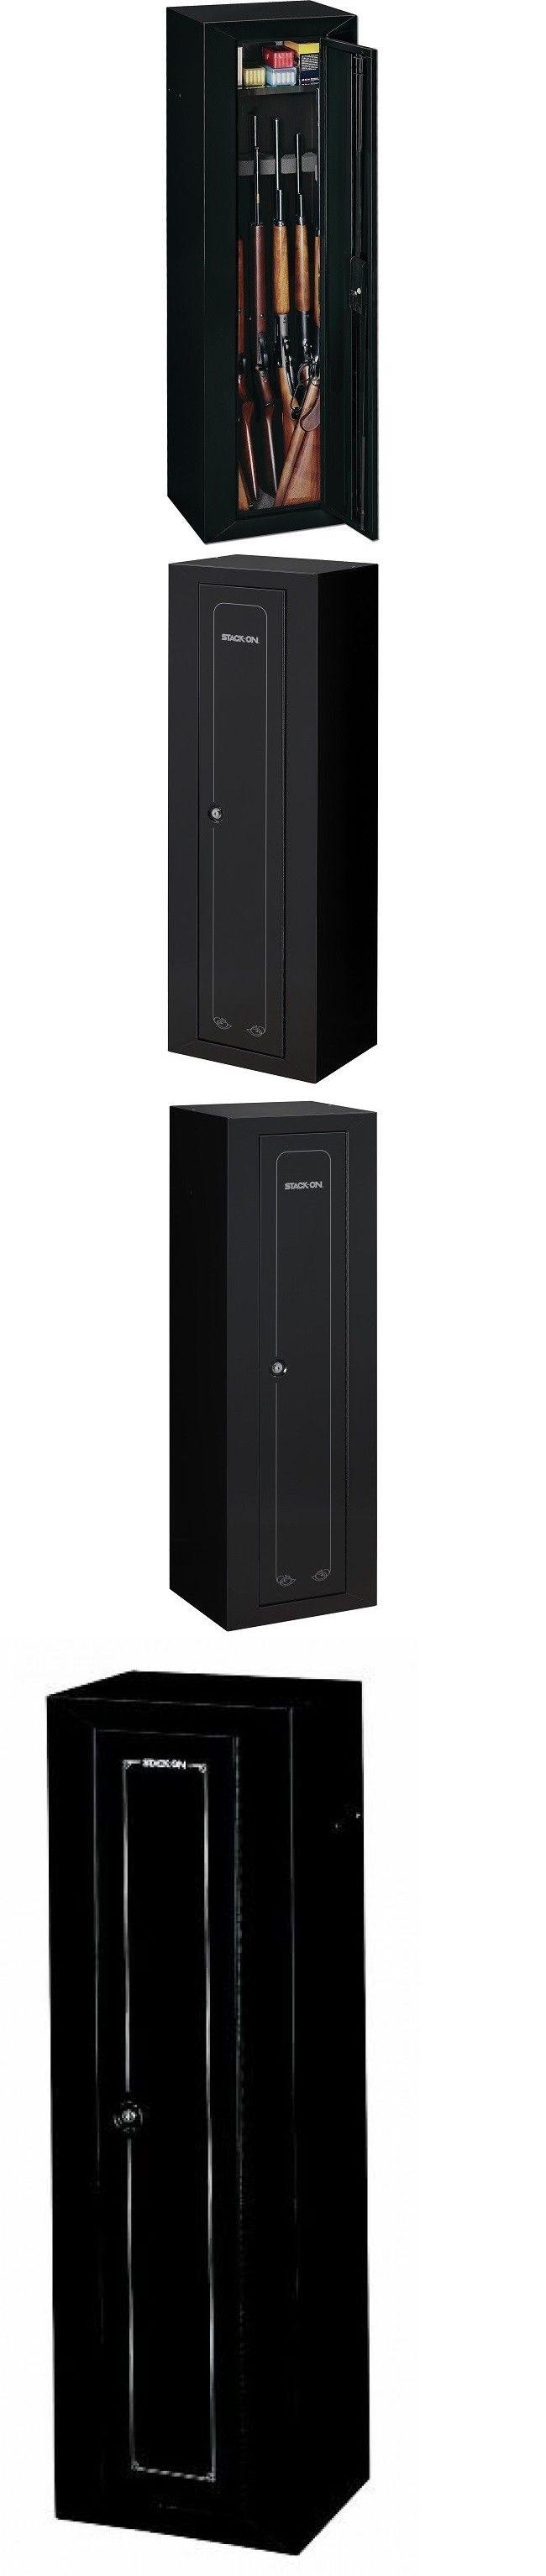 Cabinets and Safes 177877: Gun Cabinet Black 10 Gun Storage Steel Secure Locker W Shelf Rifle Shotgun 52 -> BUY IT NOW ONLY: $159.99 on eBay!